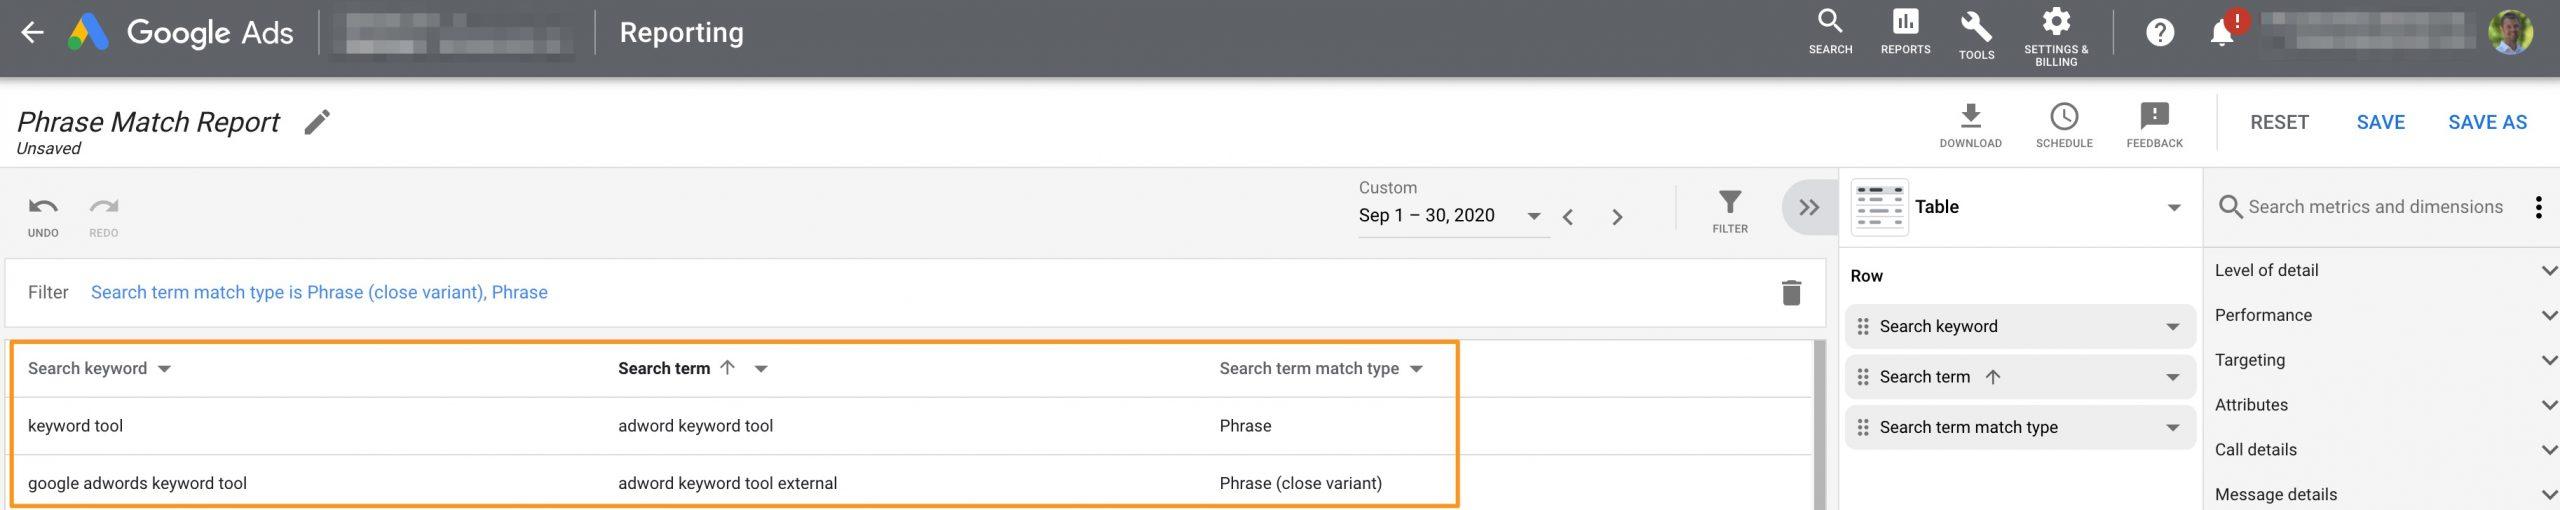 Build a phrase match close variant report.